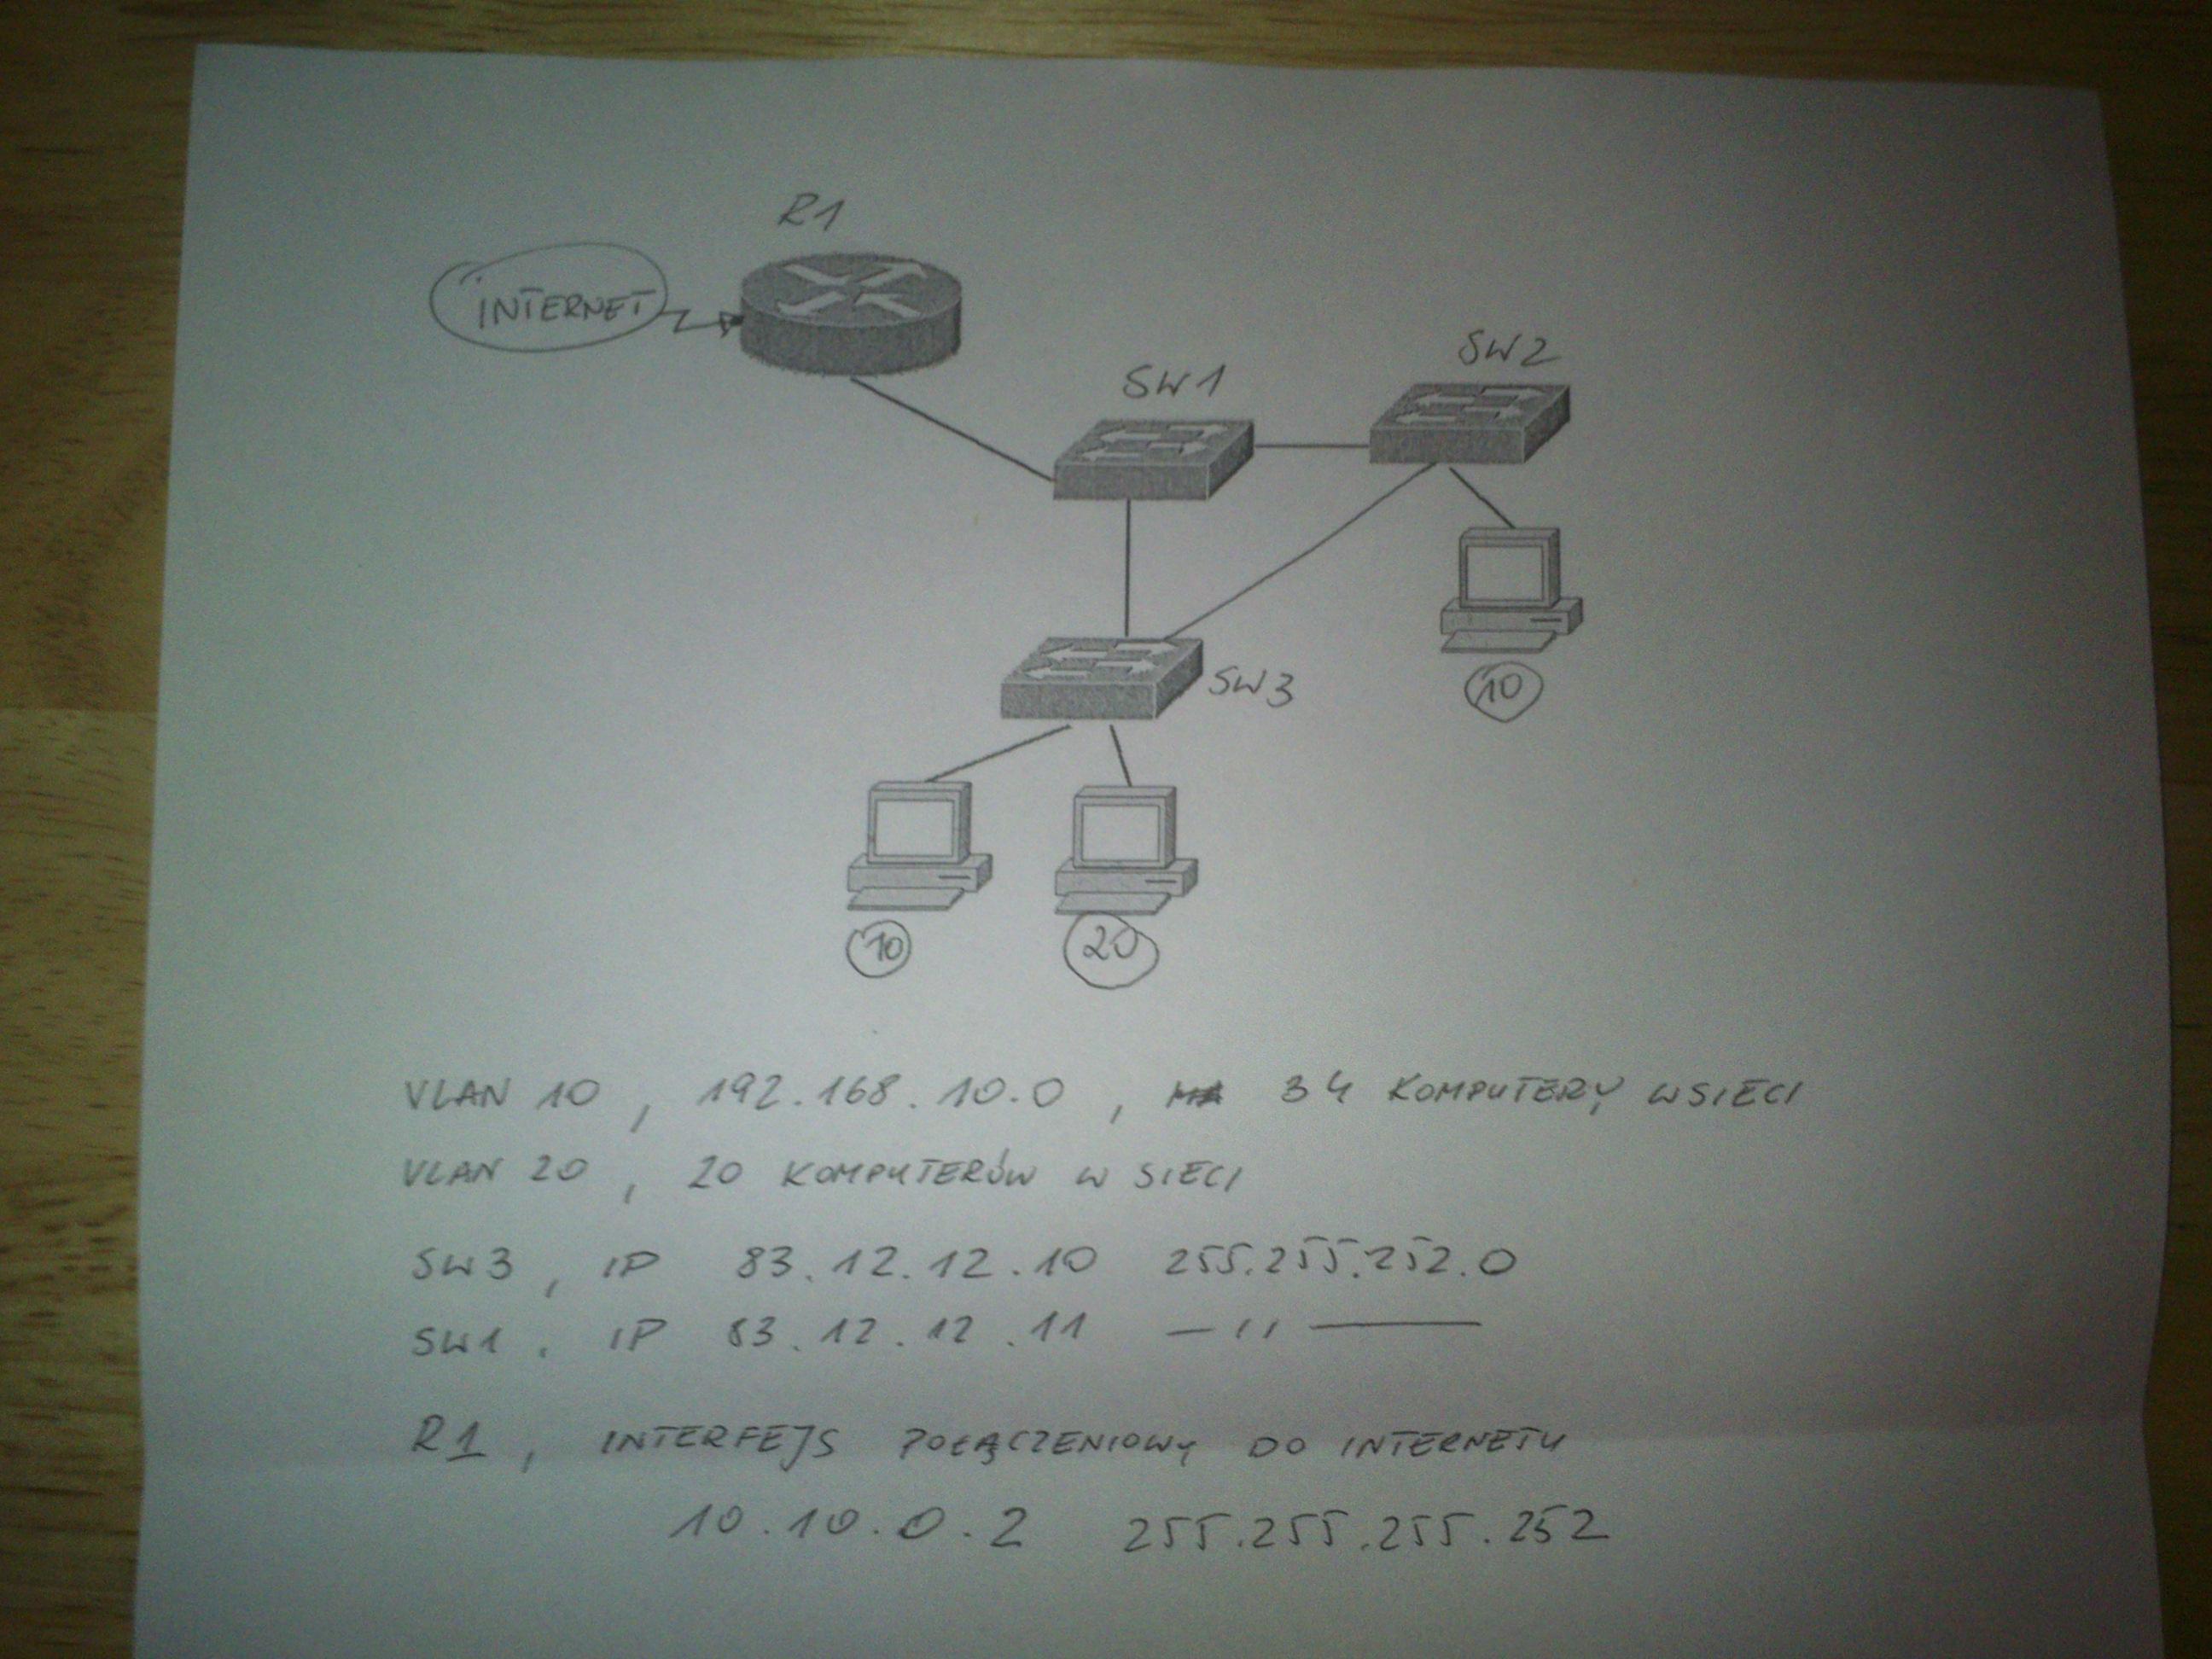 CISCO packet tracer - Adresowanie switchy